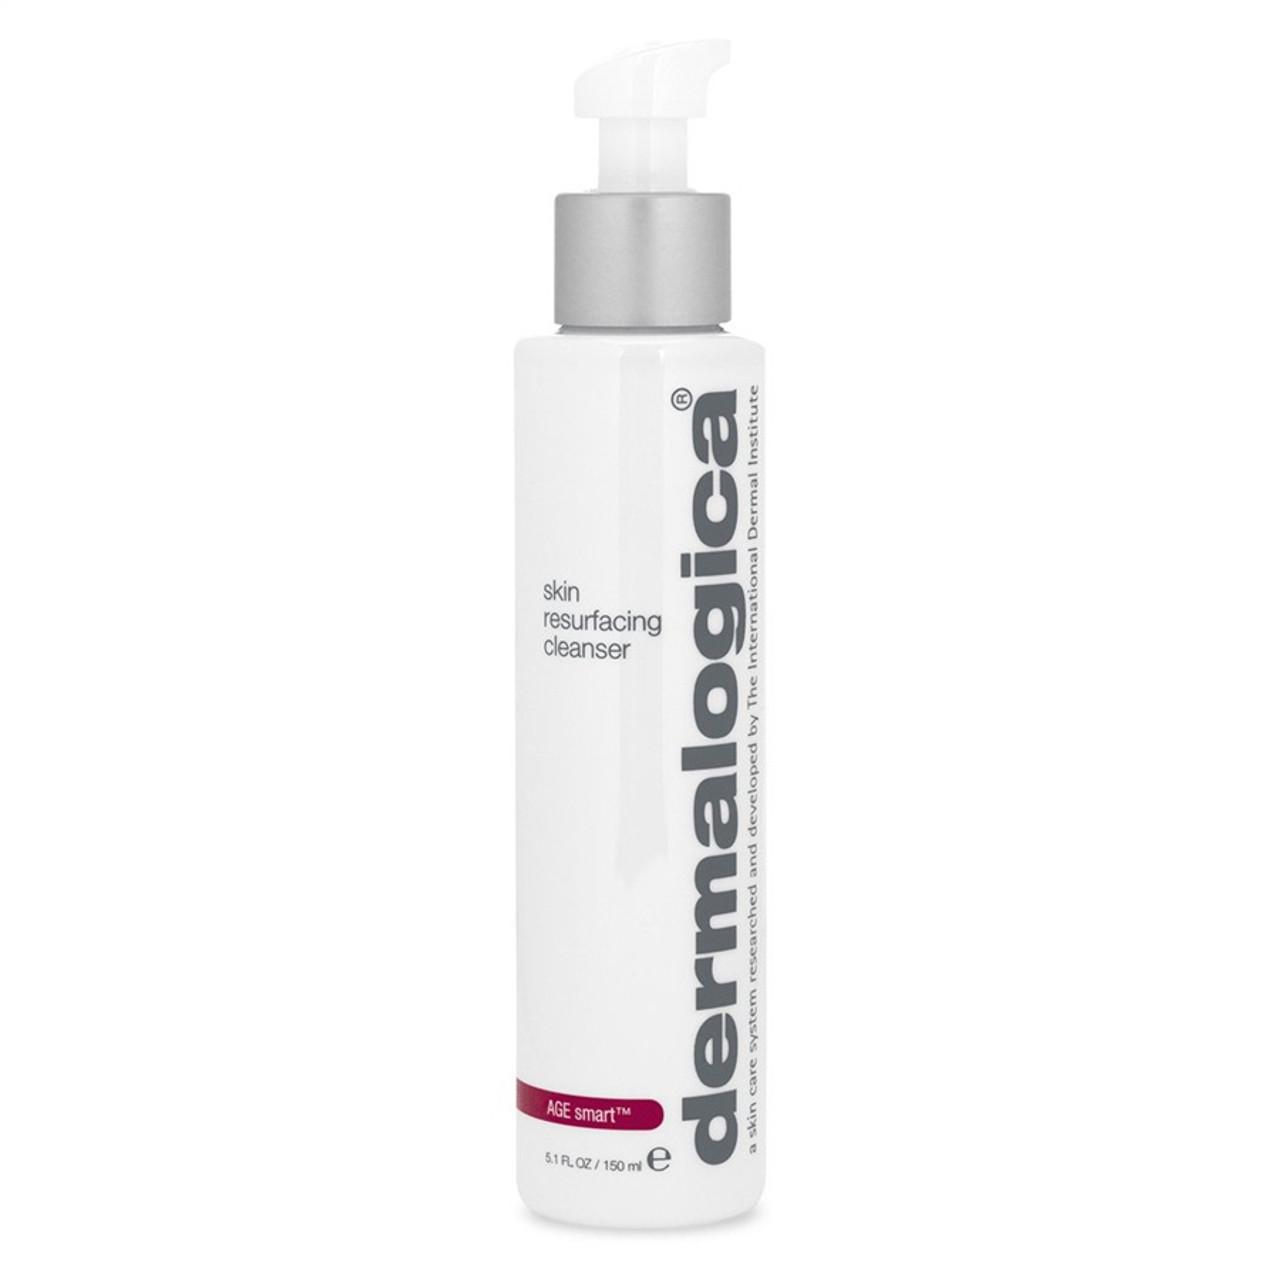 Dermalogica Skin Resurfacing Cleanser - 5.1 OZ